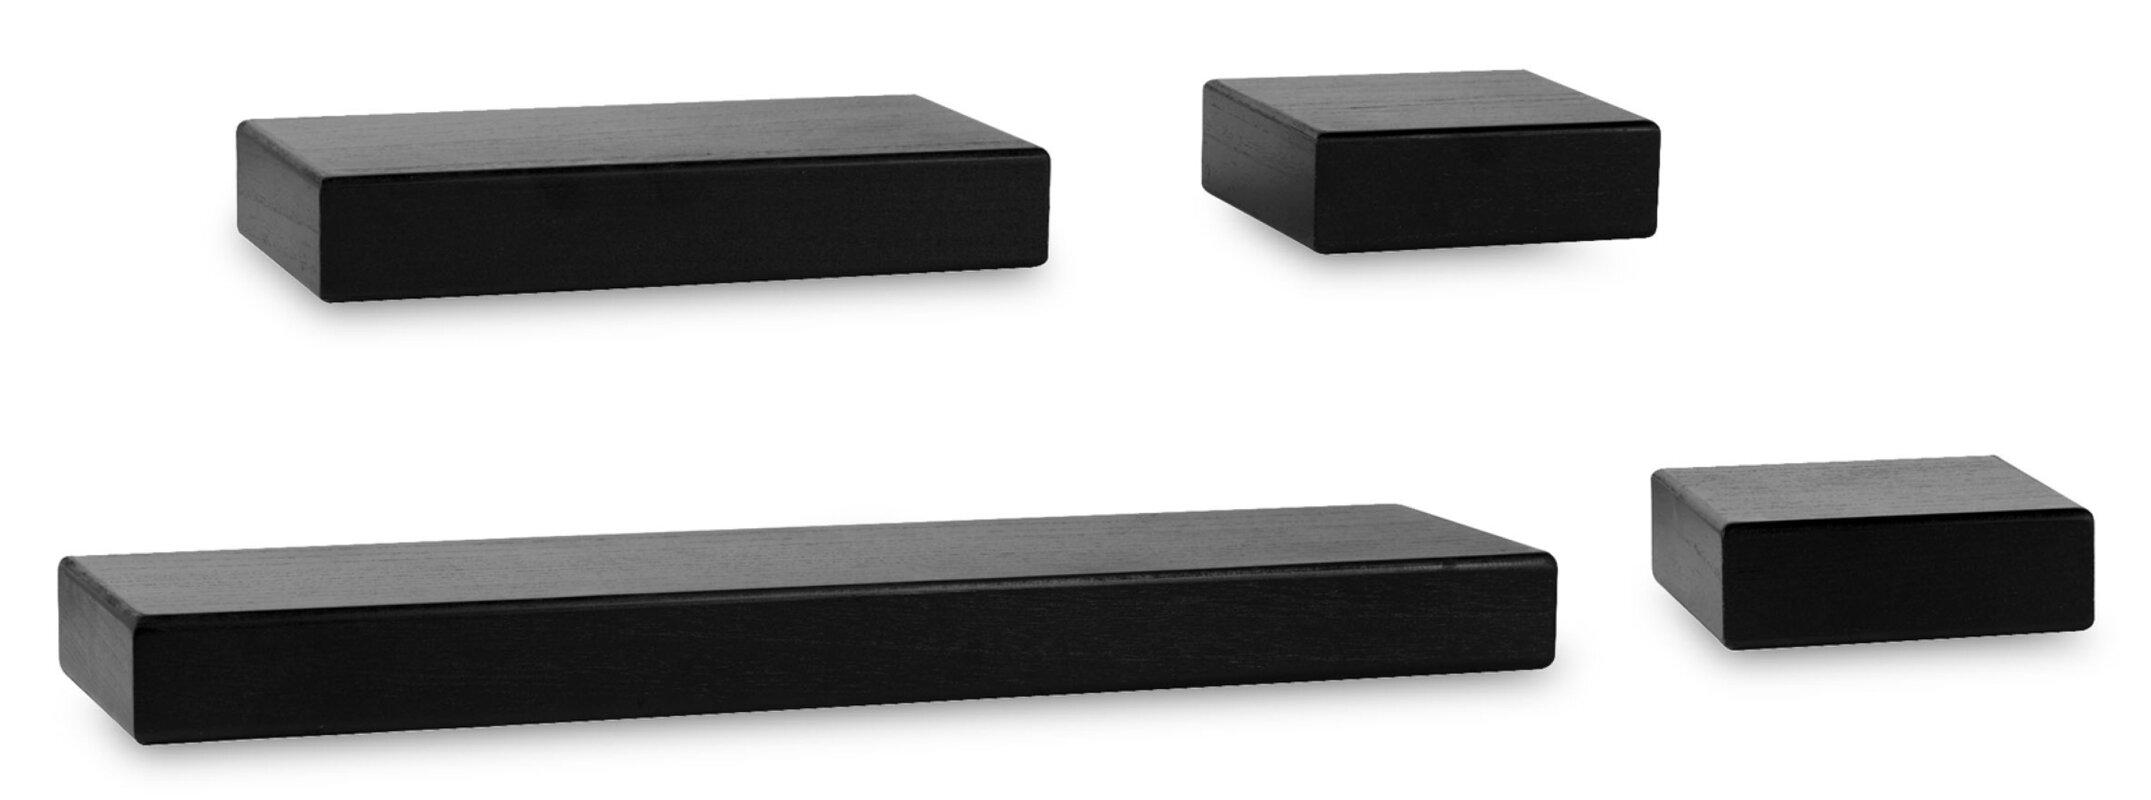 Melannco Chunky Ledge 4 Piece Floating Shelf Set & Reviews | Wayfair